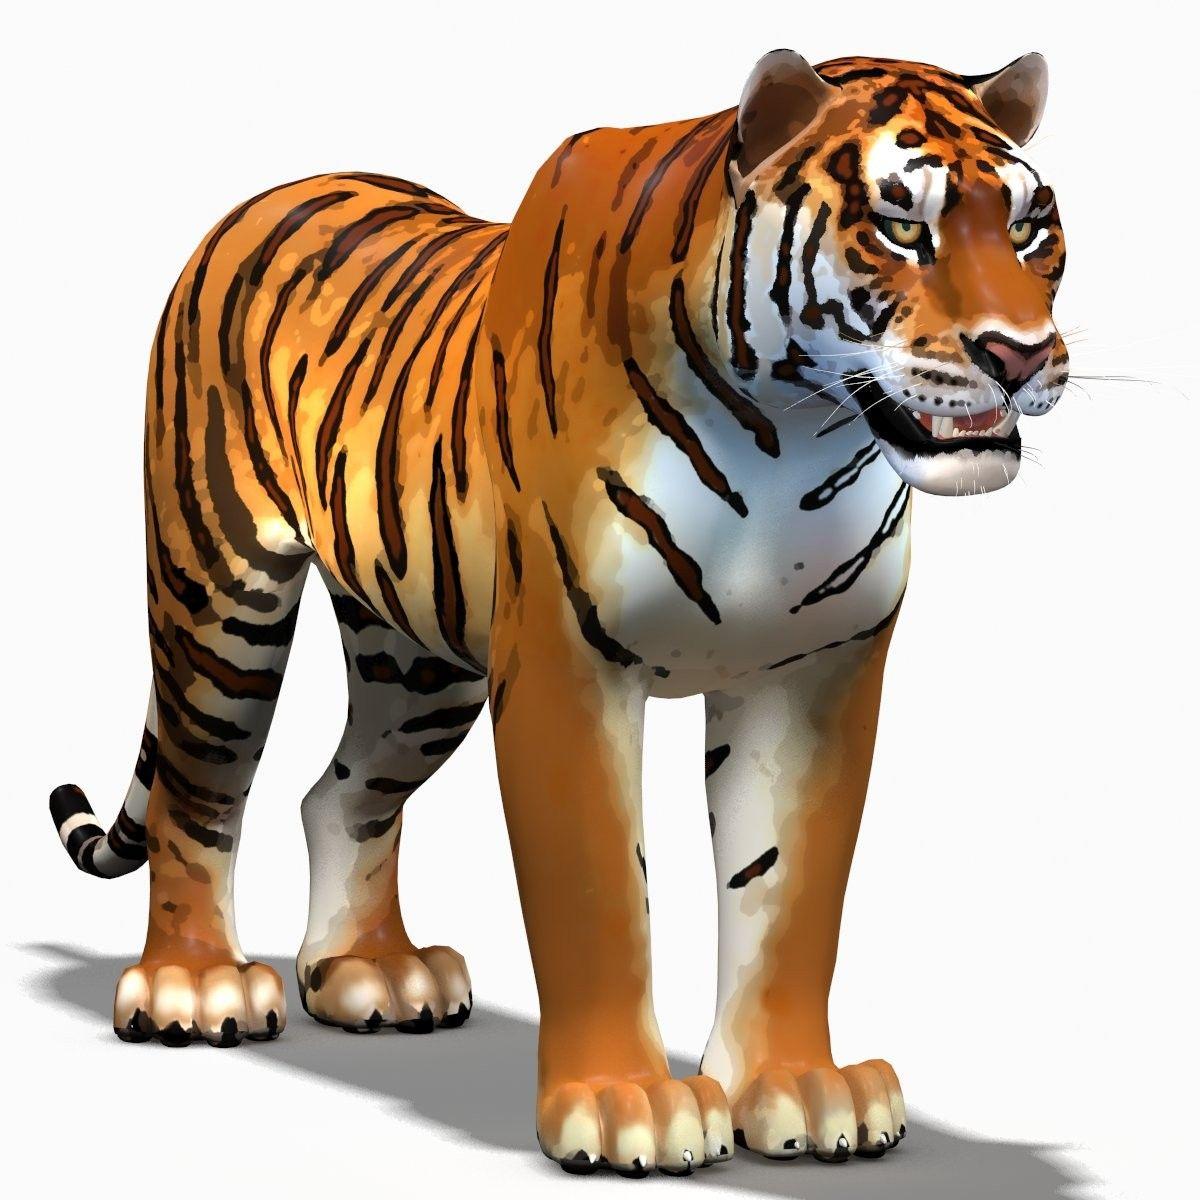 3d cartoon tiger Cartoon tiger, 3d cartoon, Cartoon